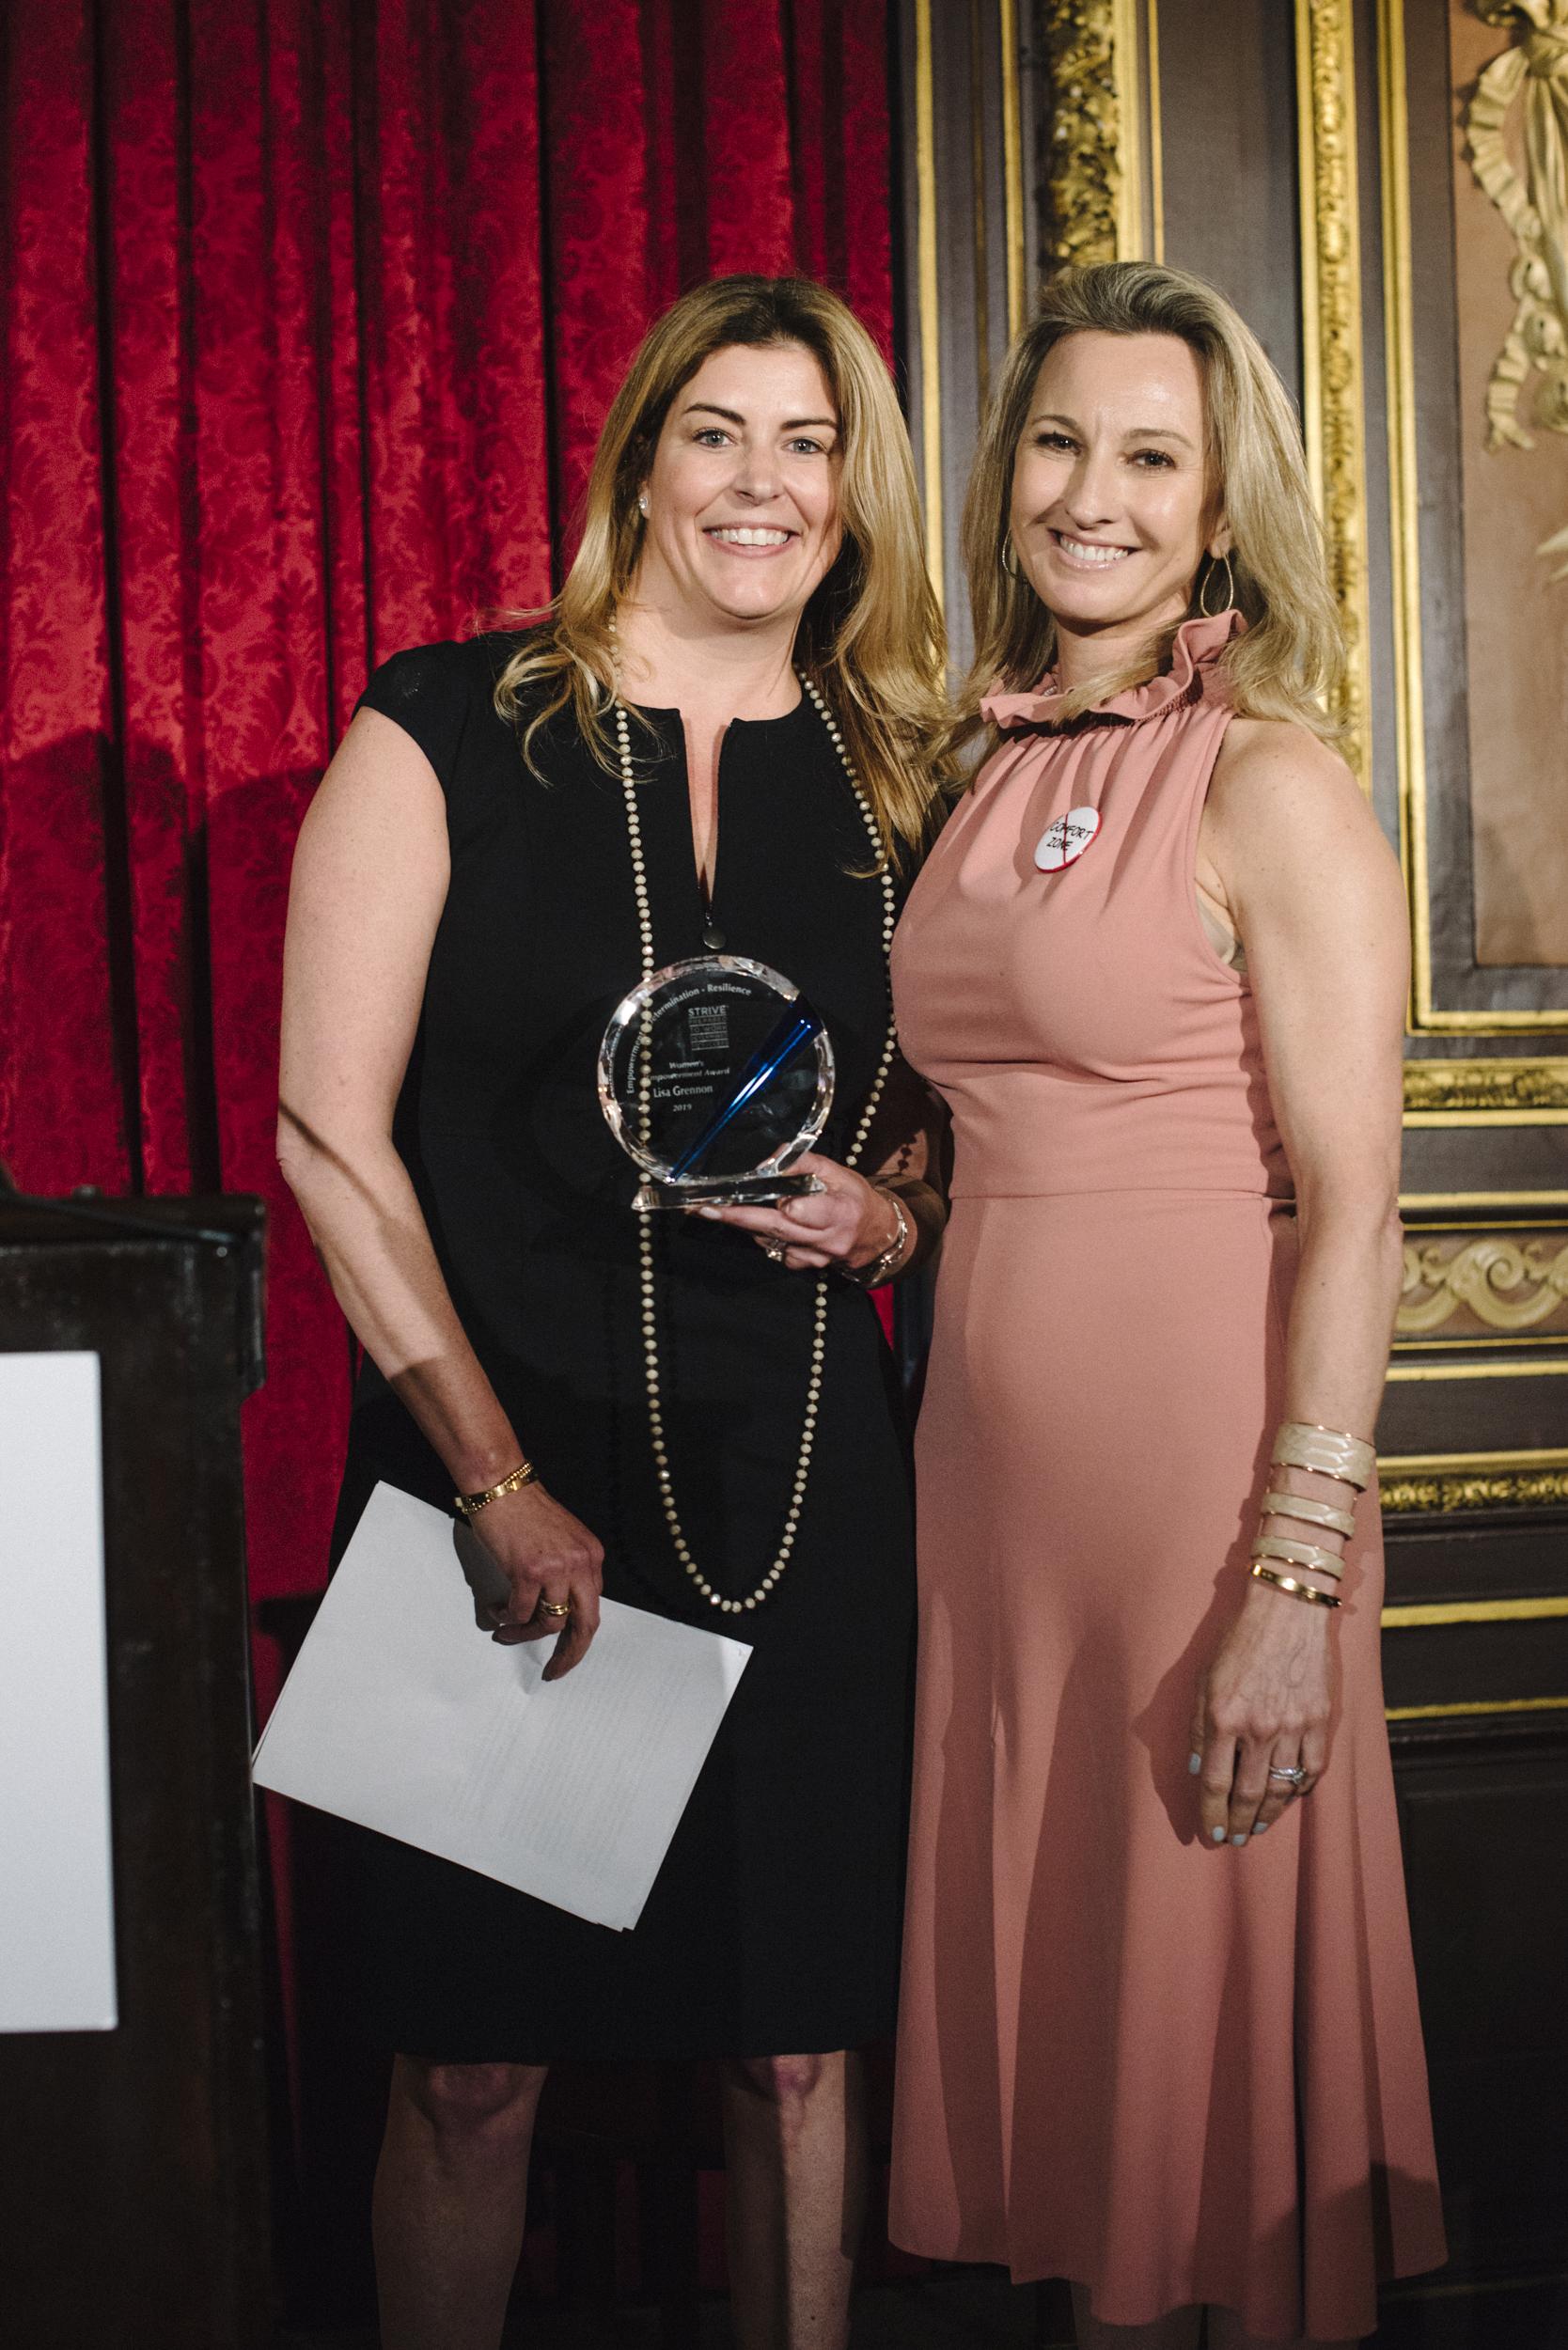 Lisa Tonia with Award.jpg